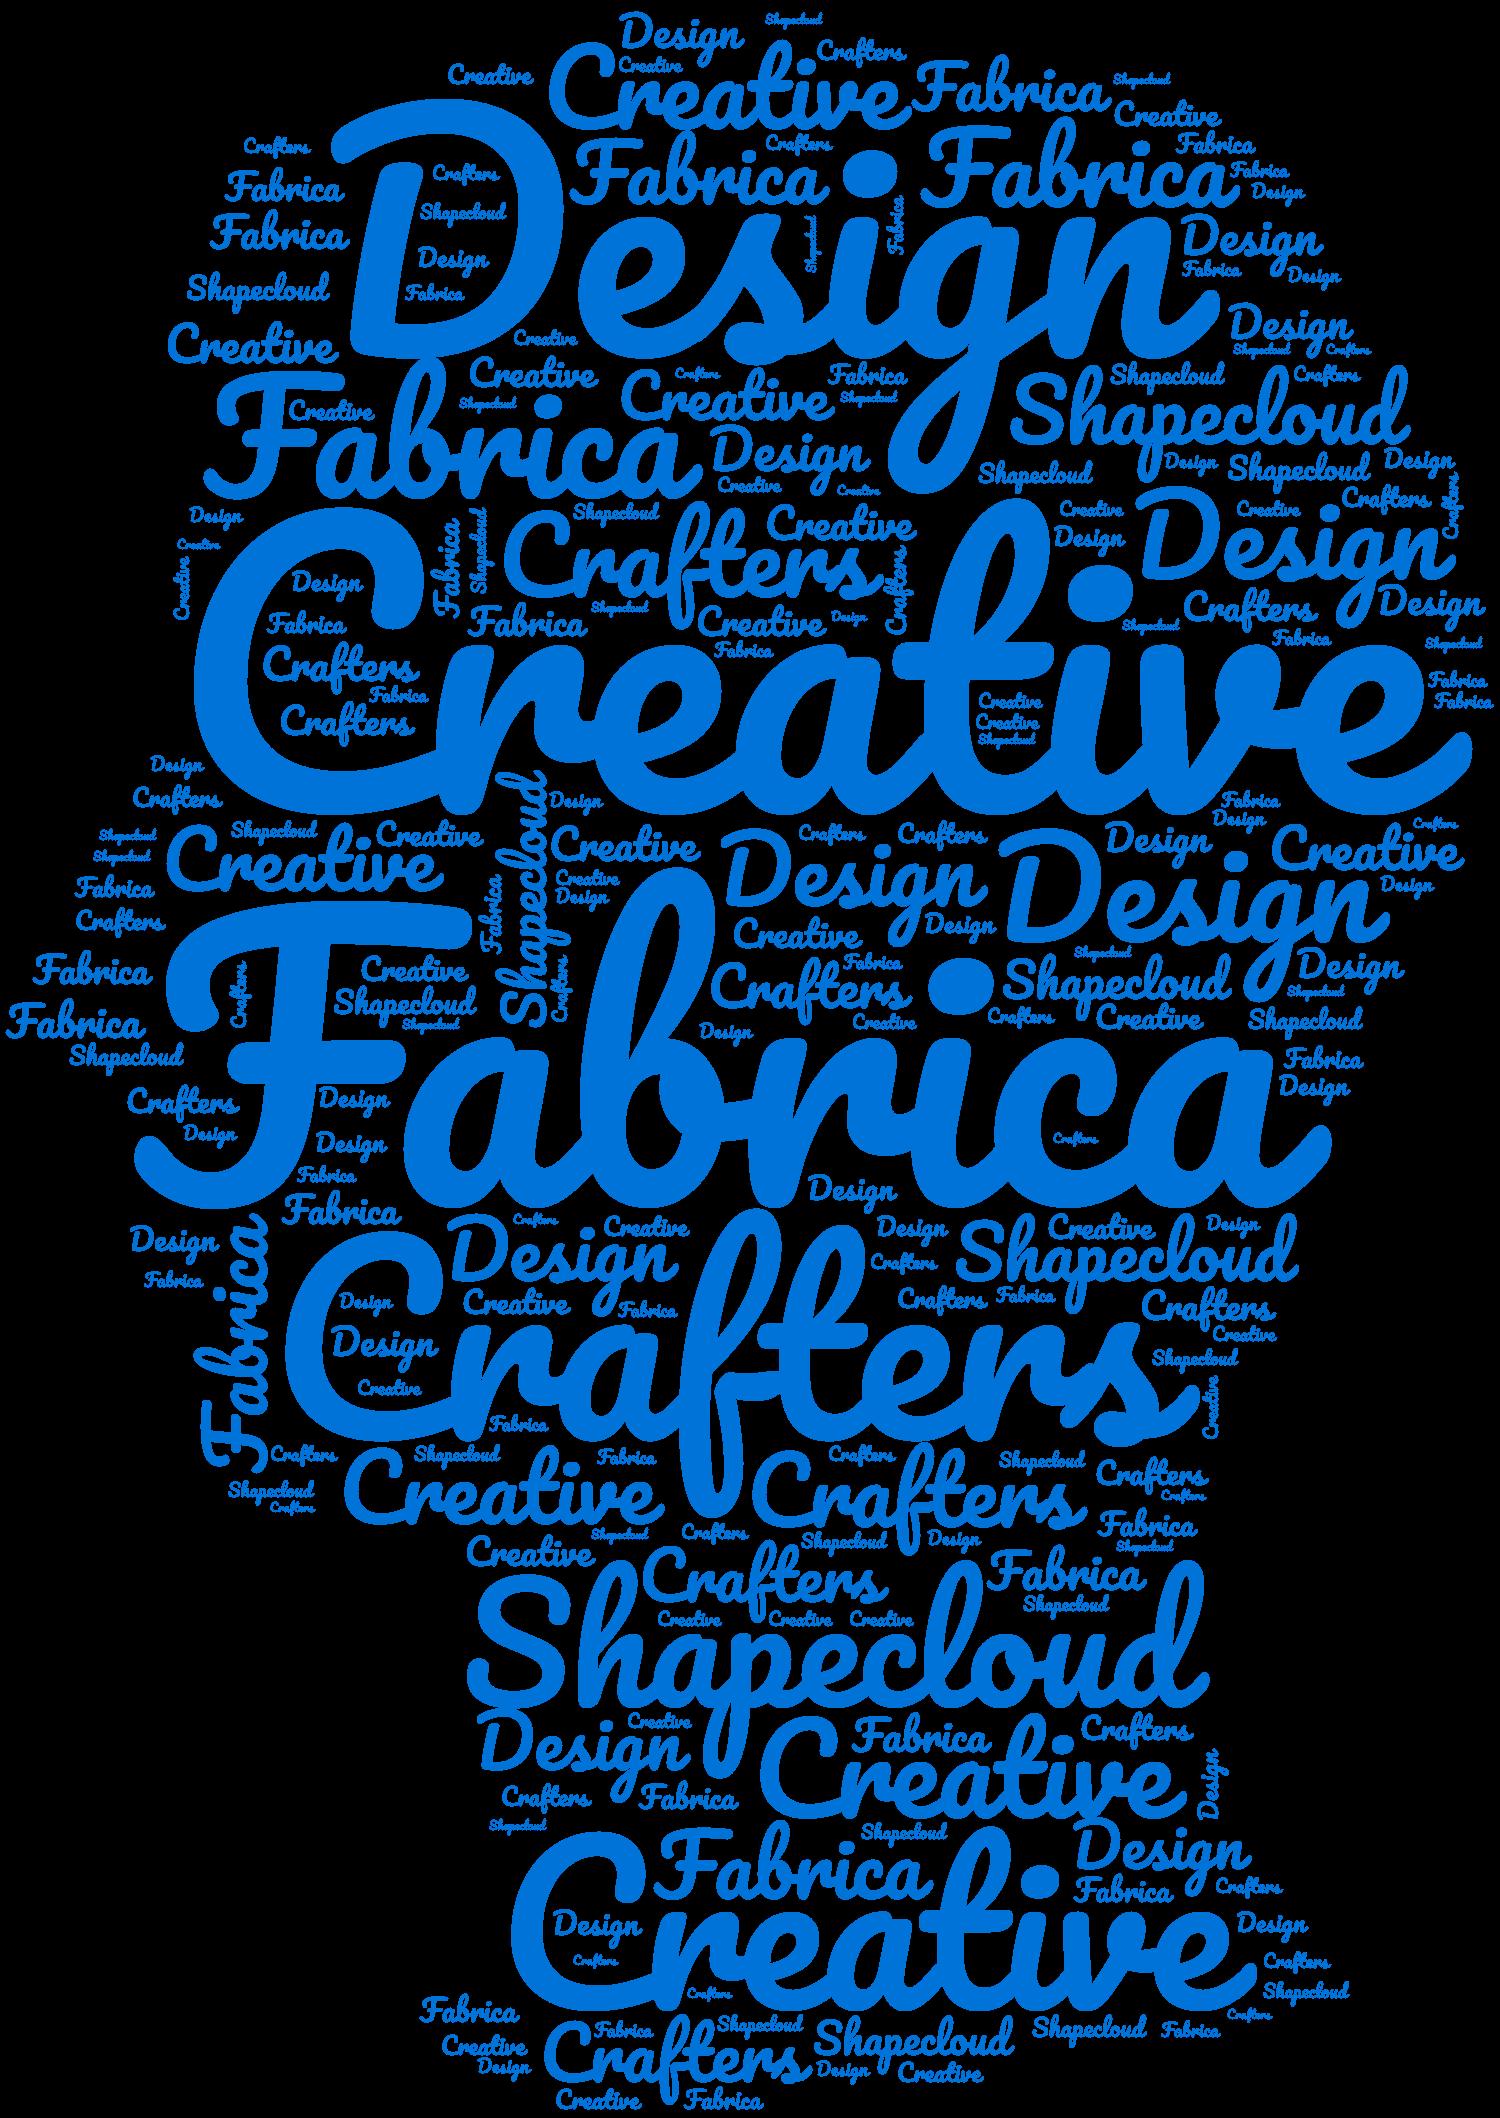 Shapecloud Creative Fabrica Free word art generator